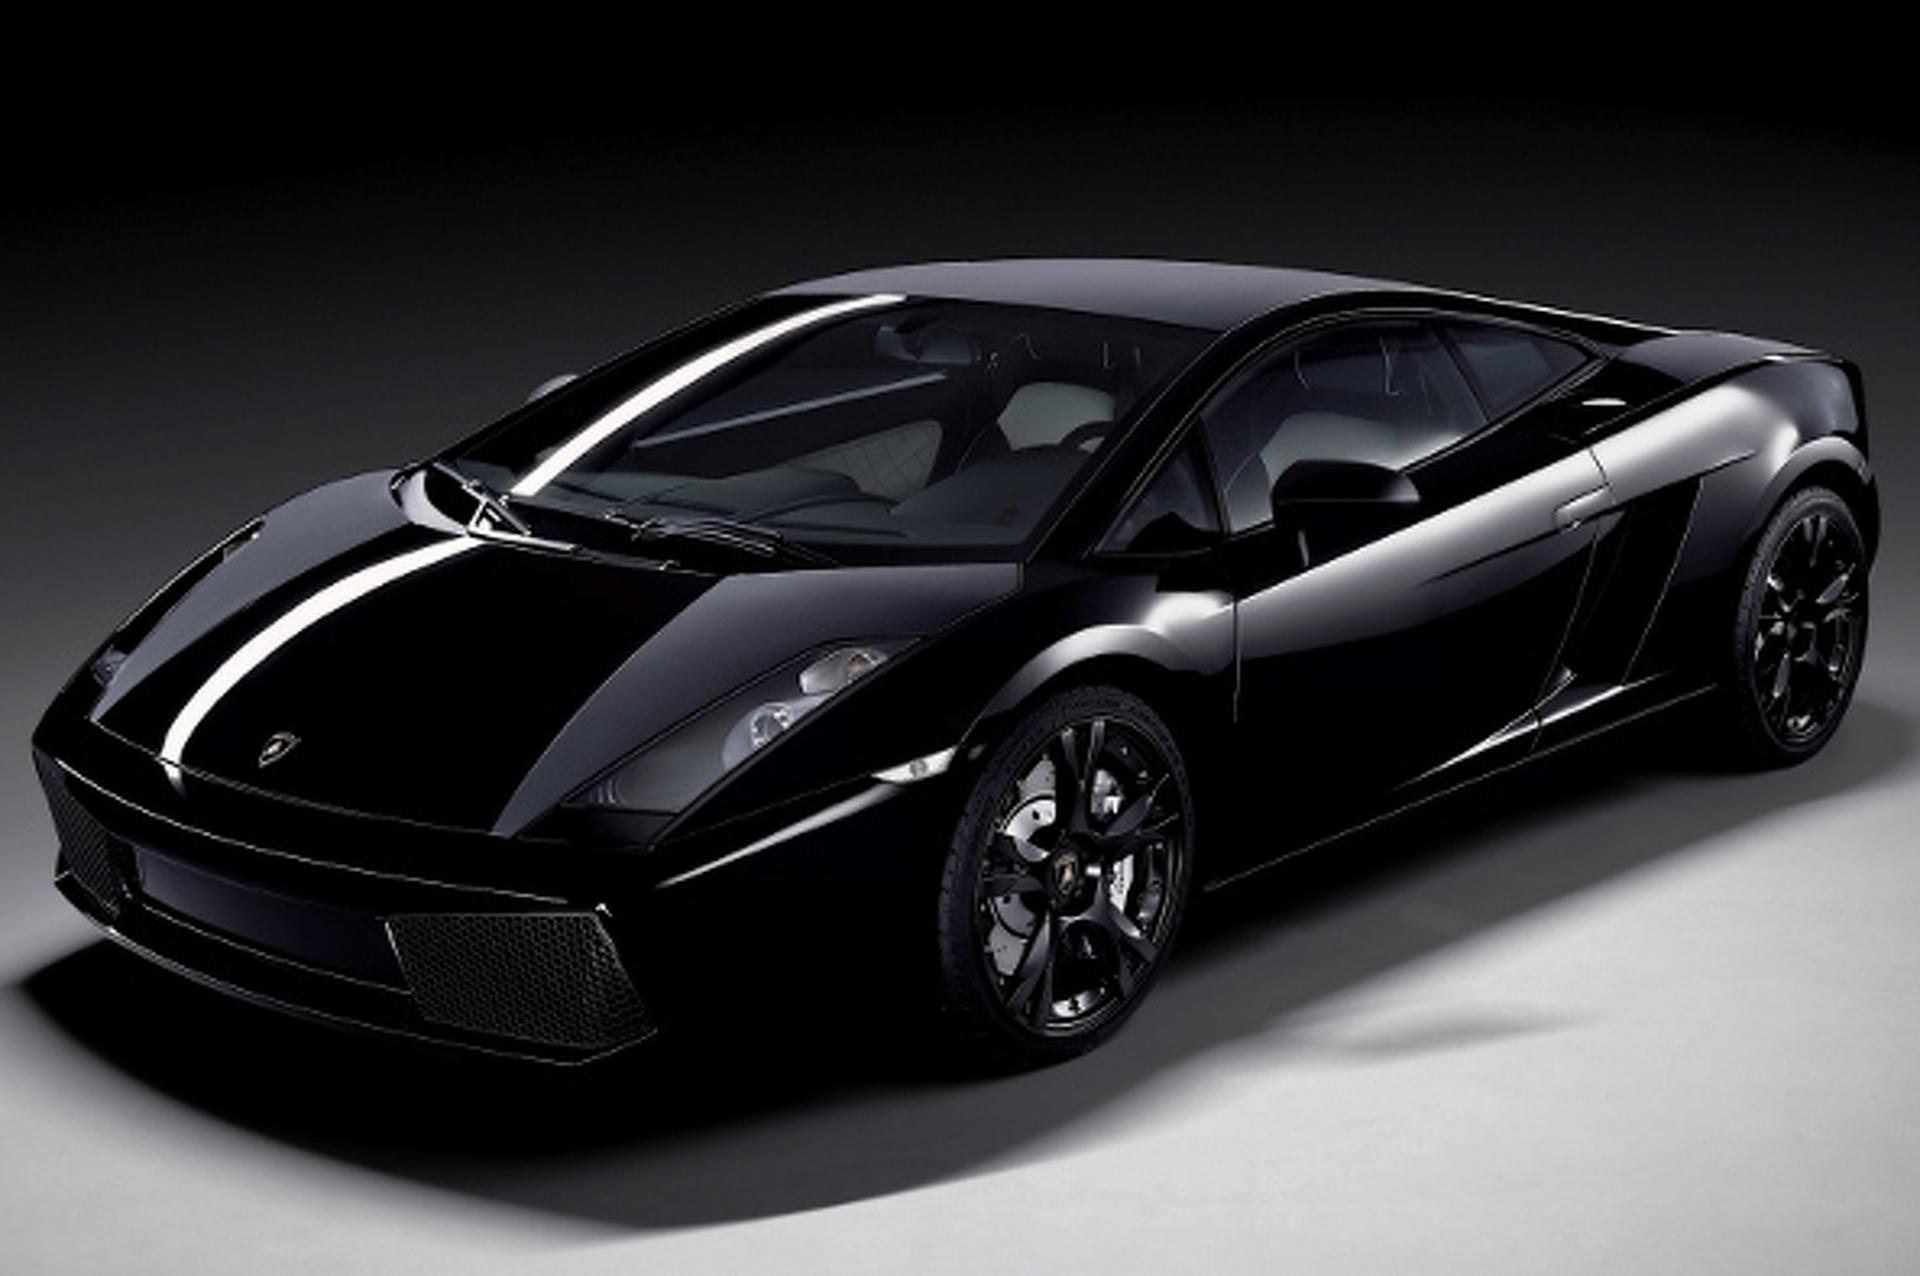 Reckless Driver Pleads Guilty in 2012 Lamborghini Joyride Case